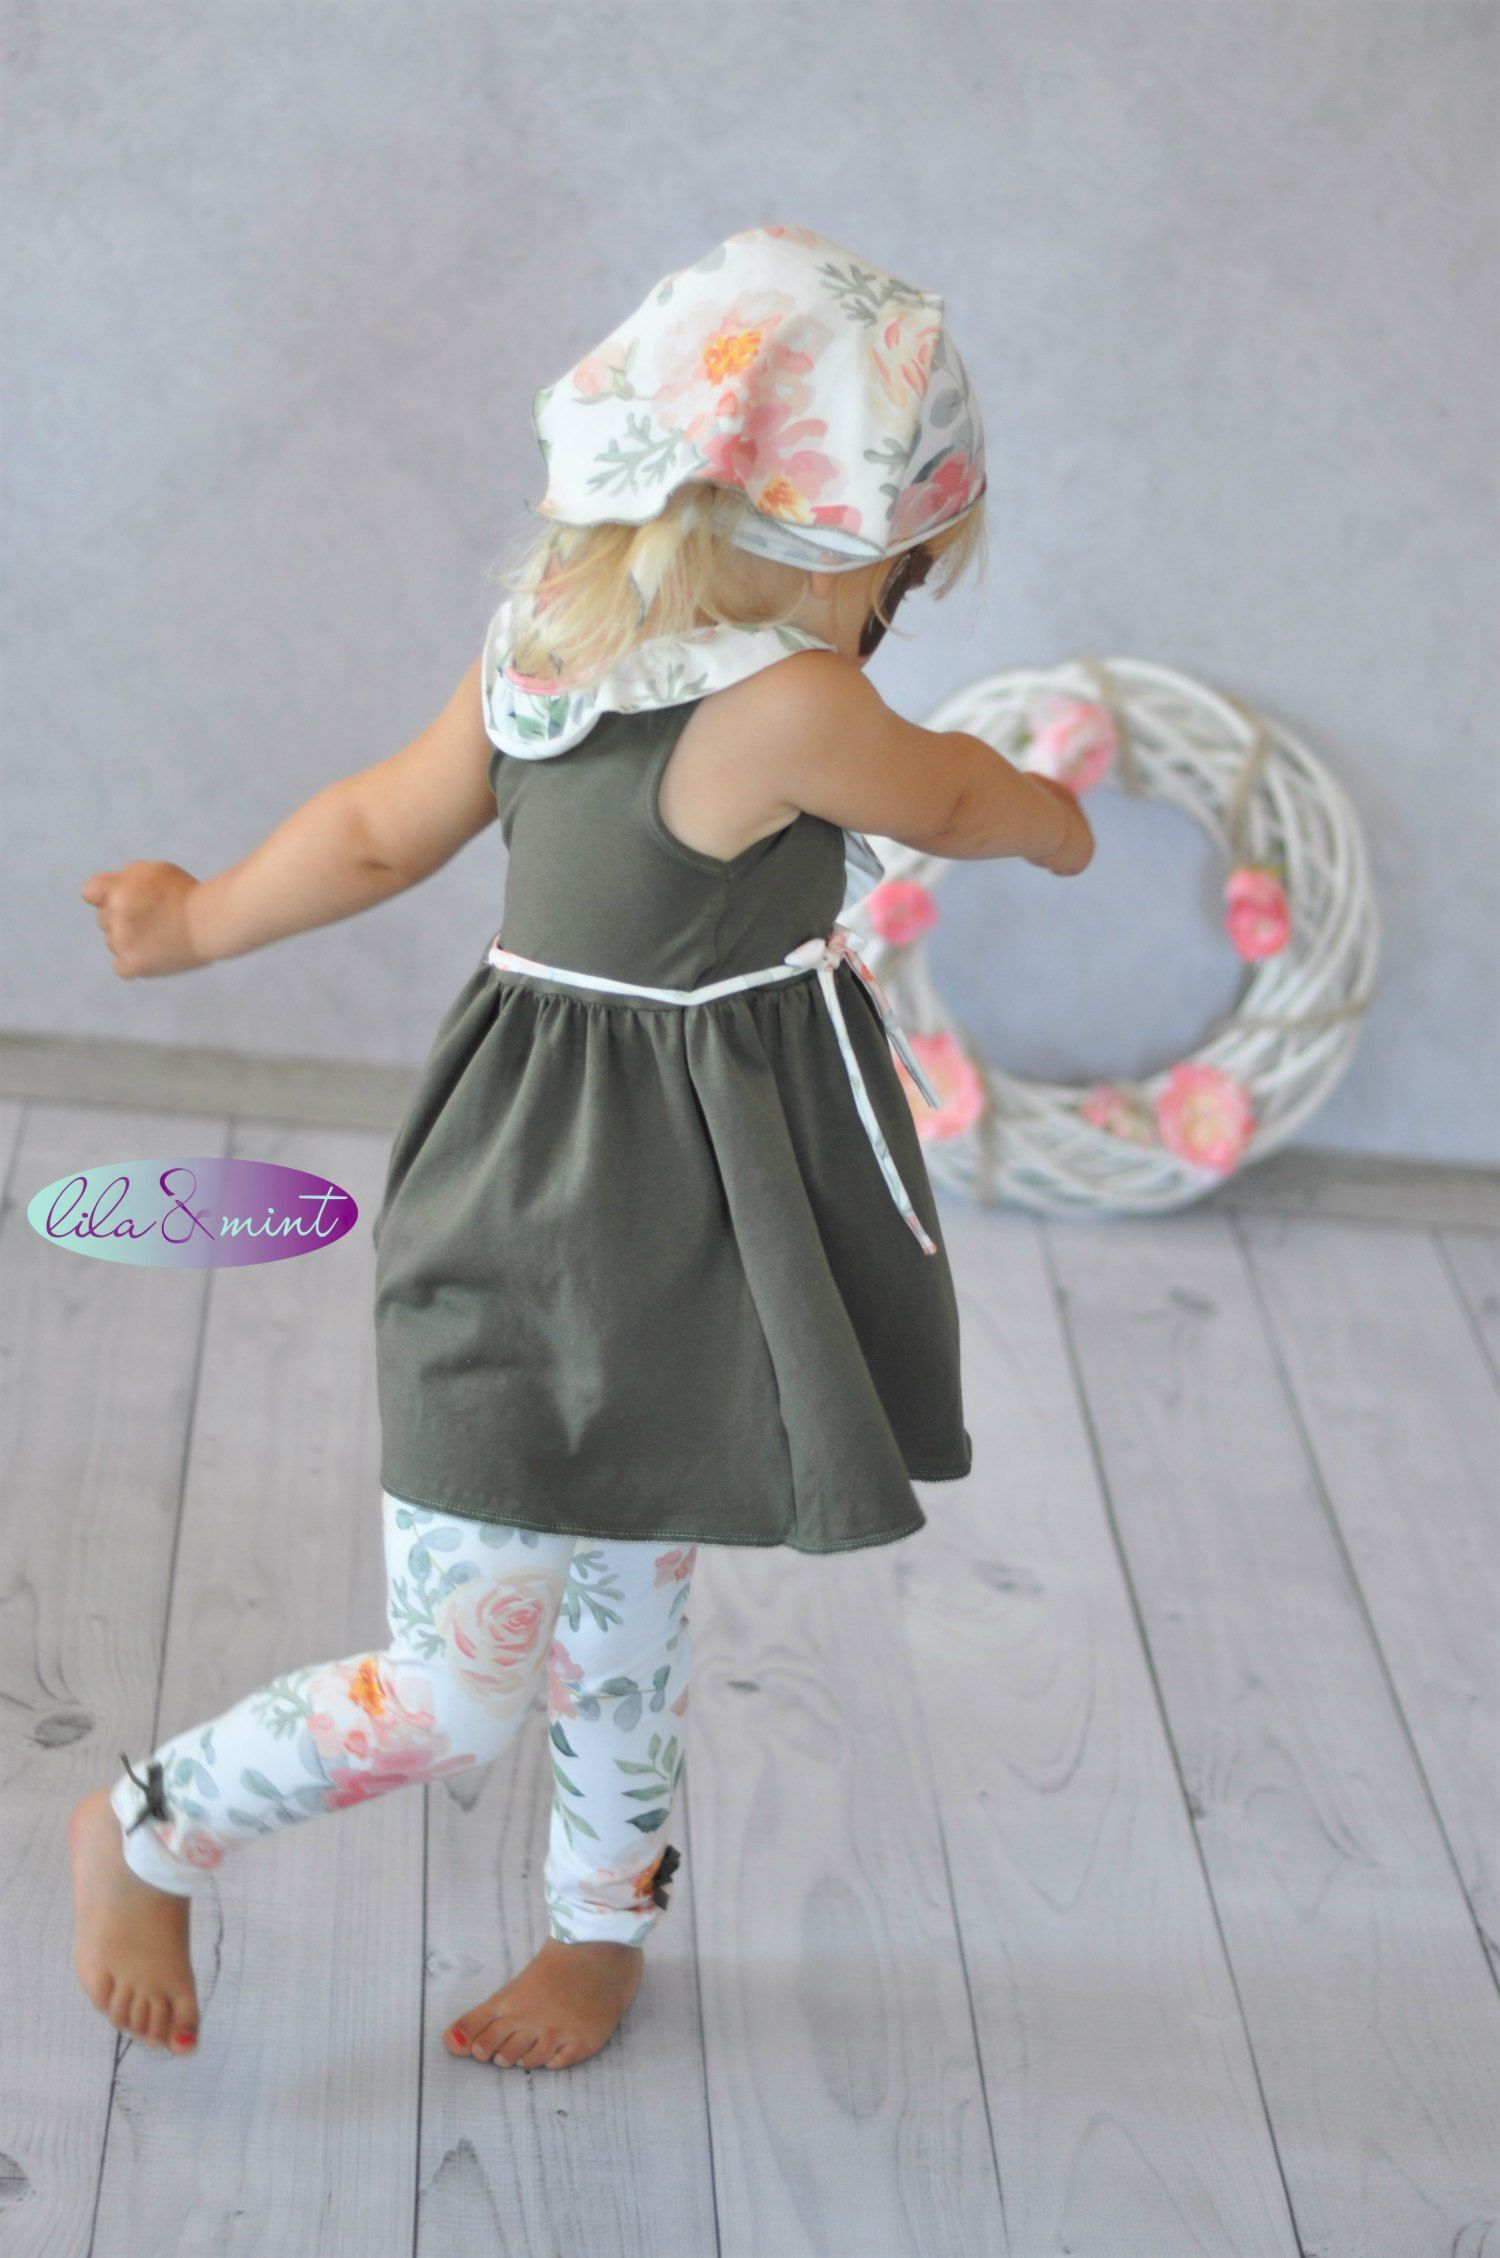 , Kleid Belle – lila & mint – nähen und bloggen, MySummer Combin Blog, MySummer Combin Blog